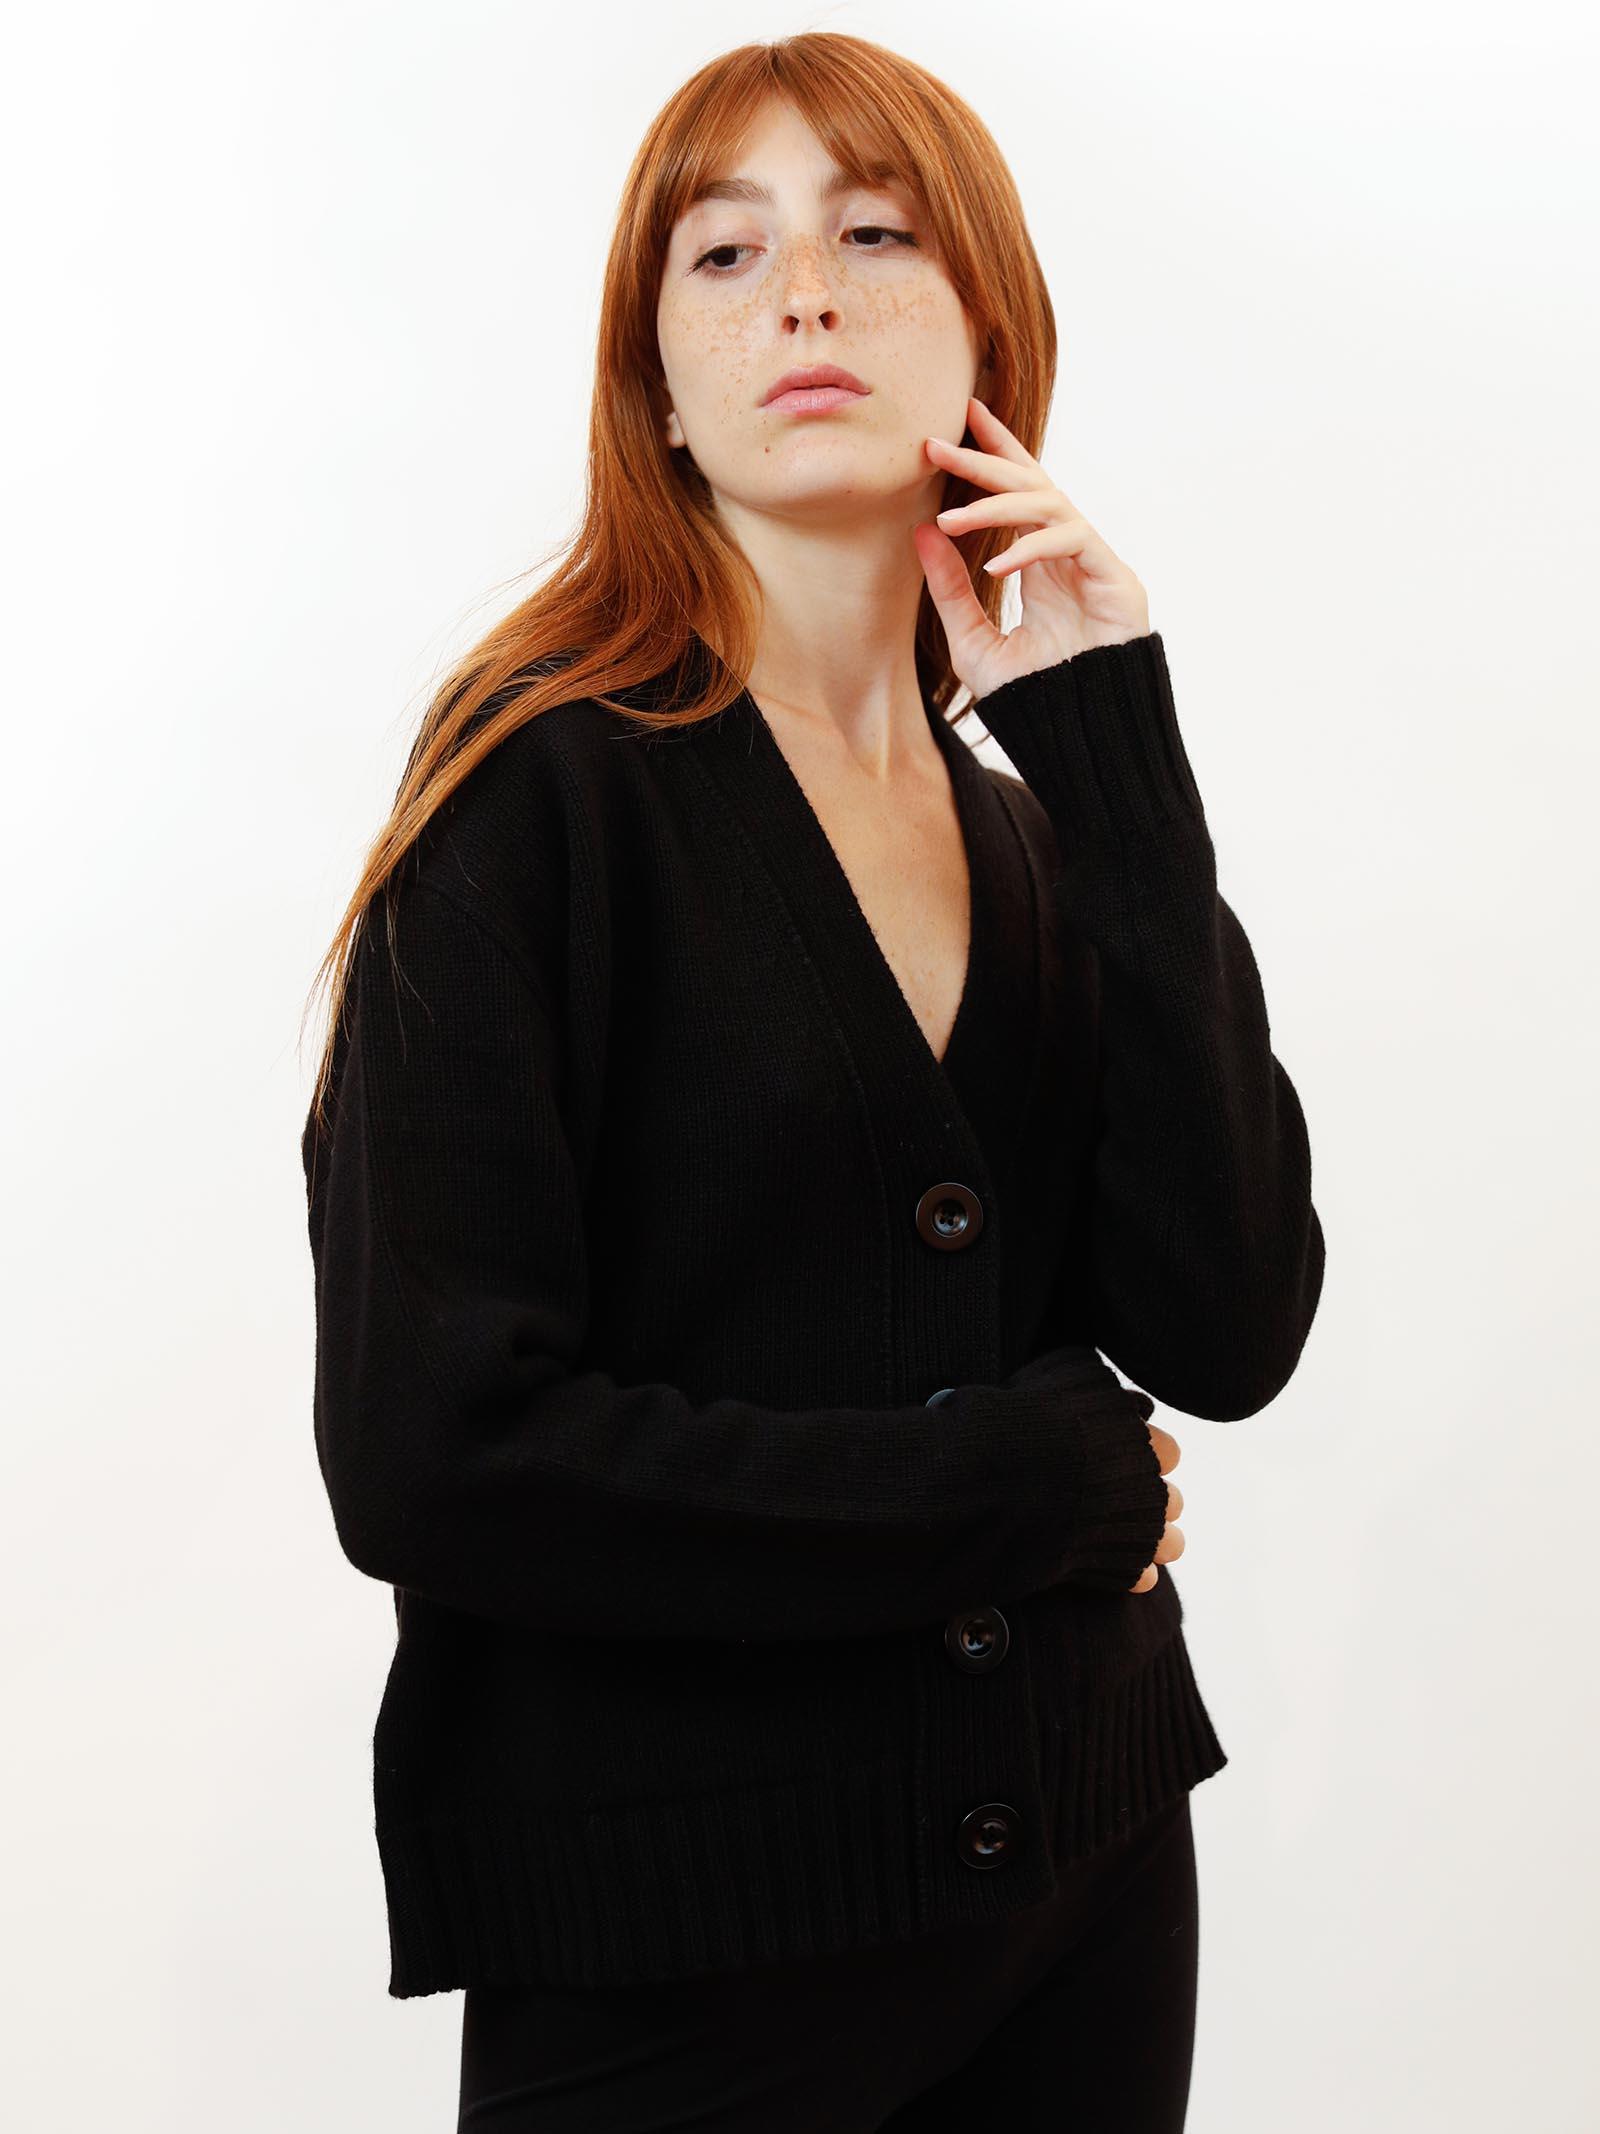 Women's Clothing Mixed Cashmere Cardigan in Black with Matching Button Maliparmi | Knitwear | JN35537431520000